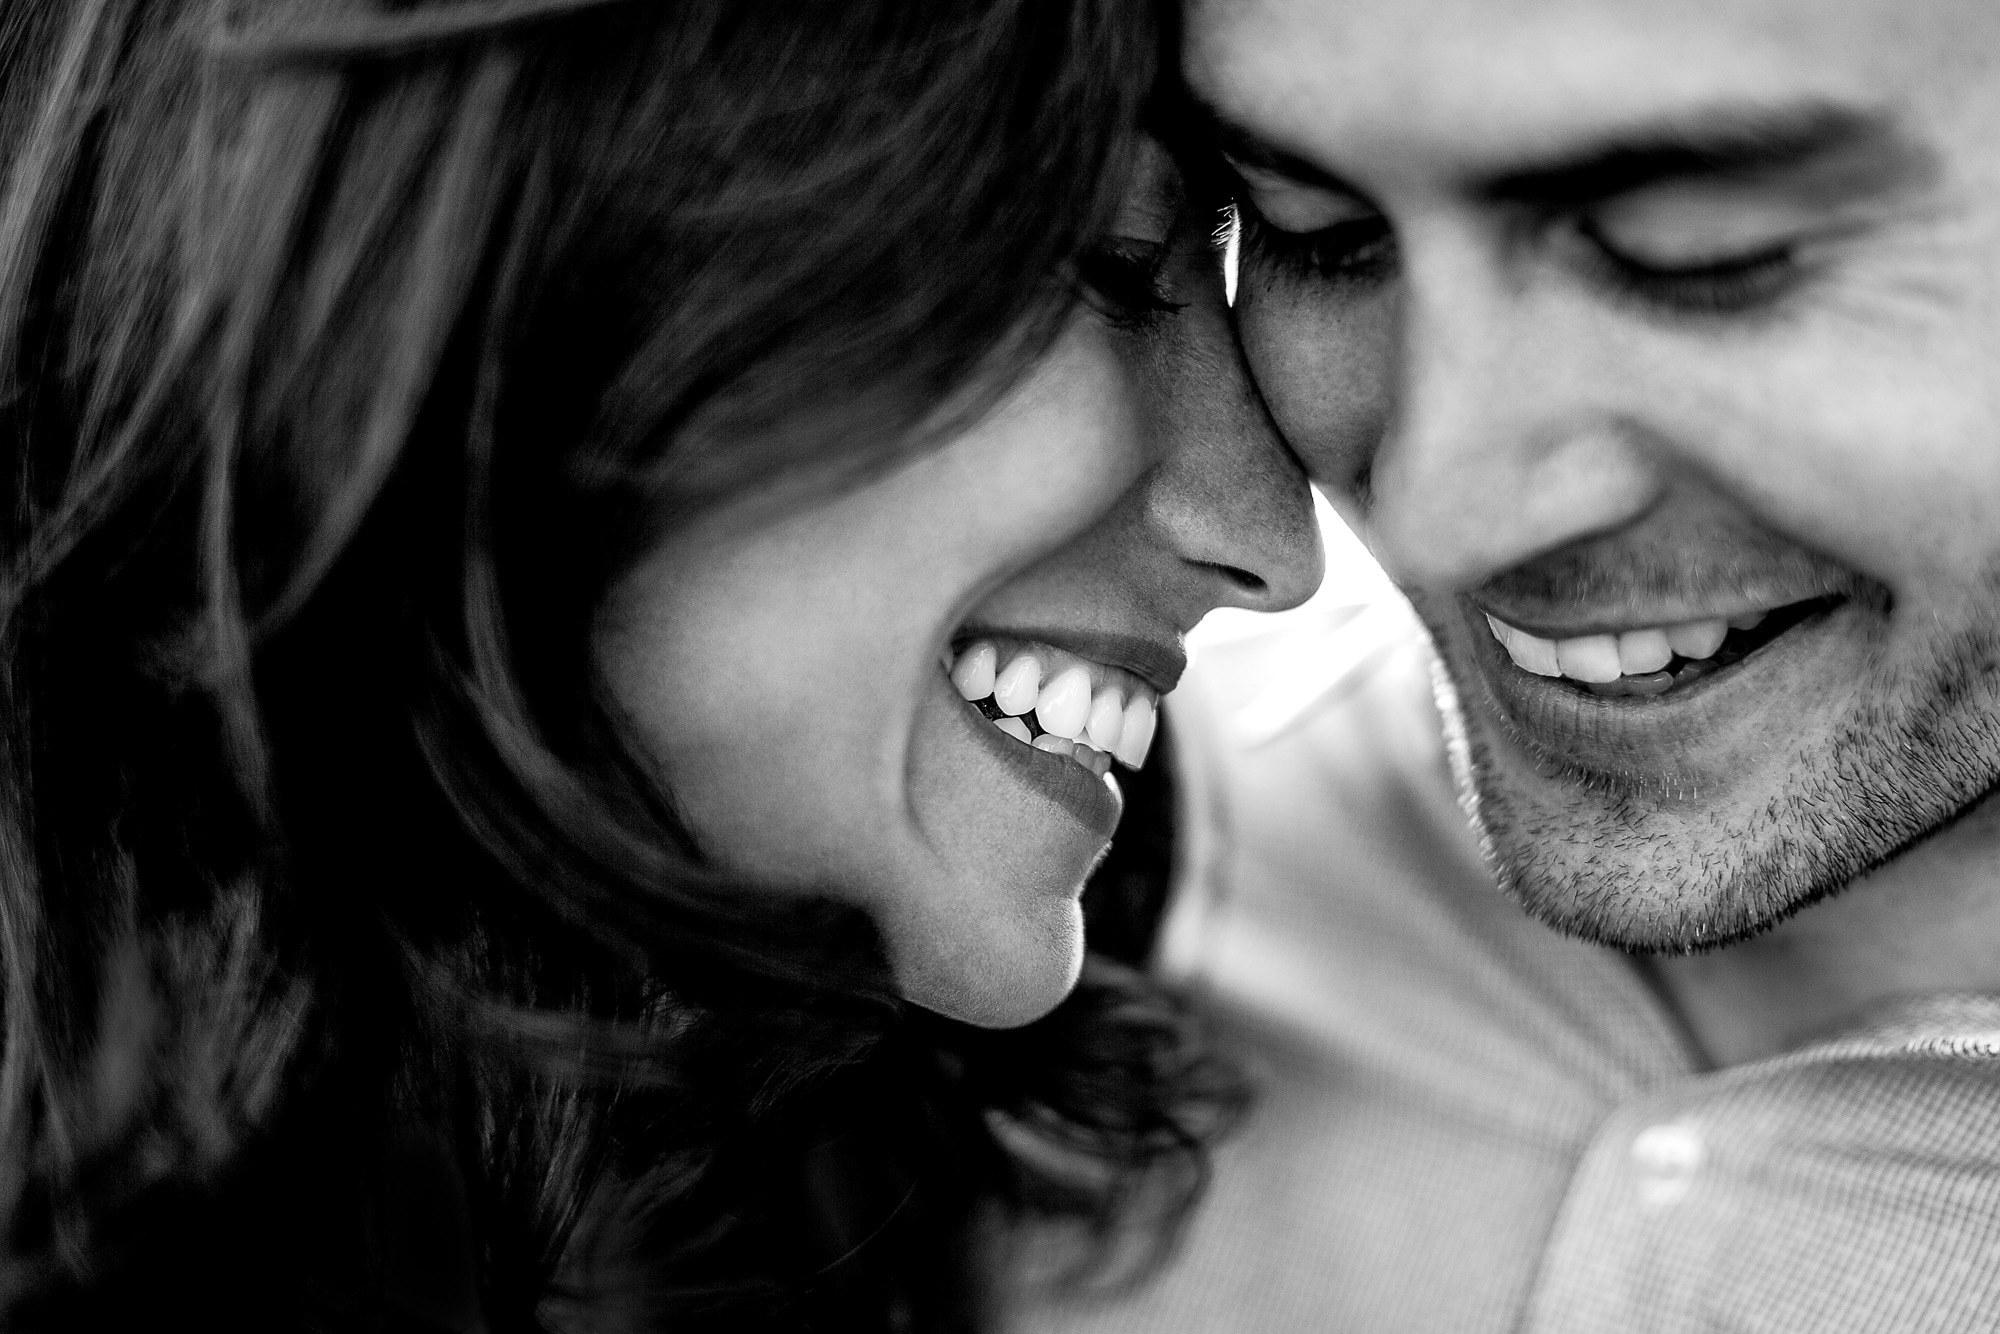 Sweet smiling couple portrait by JOS Studios